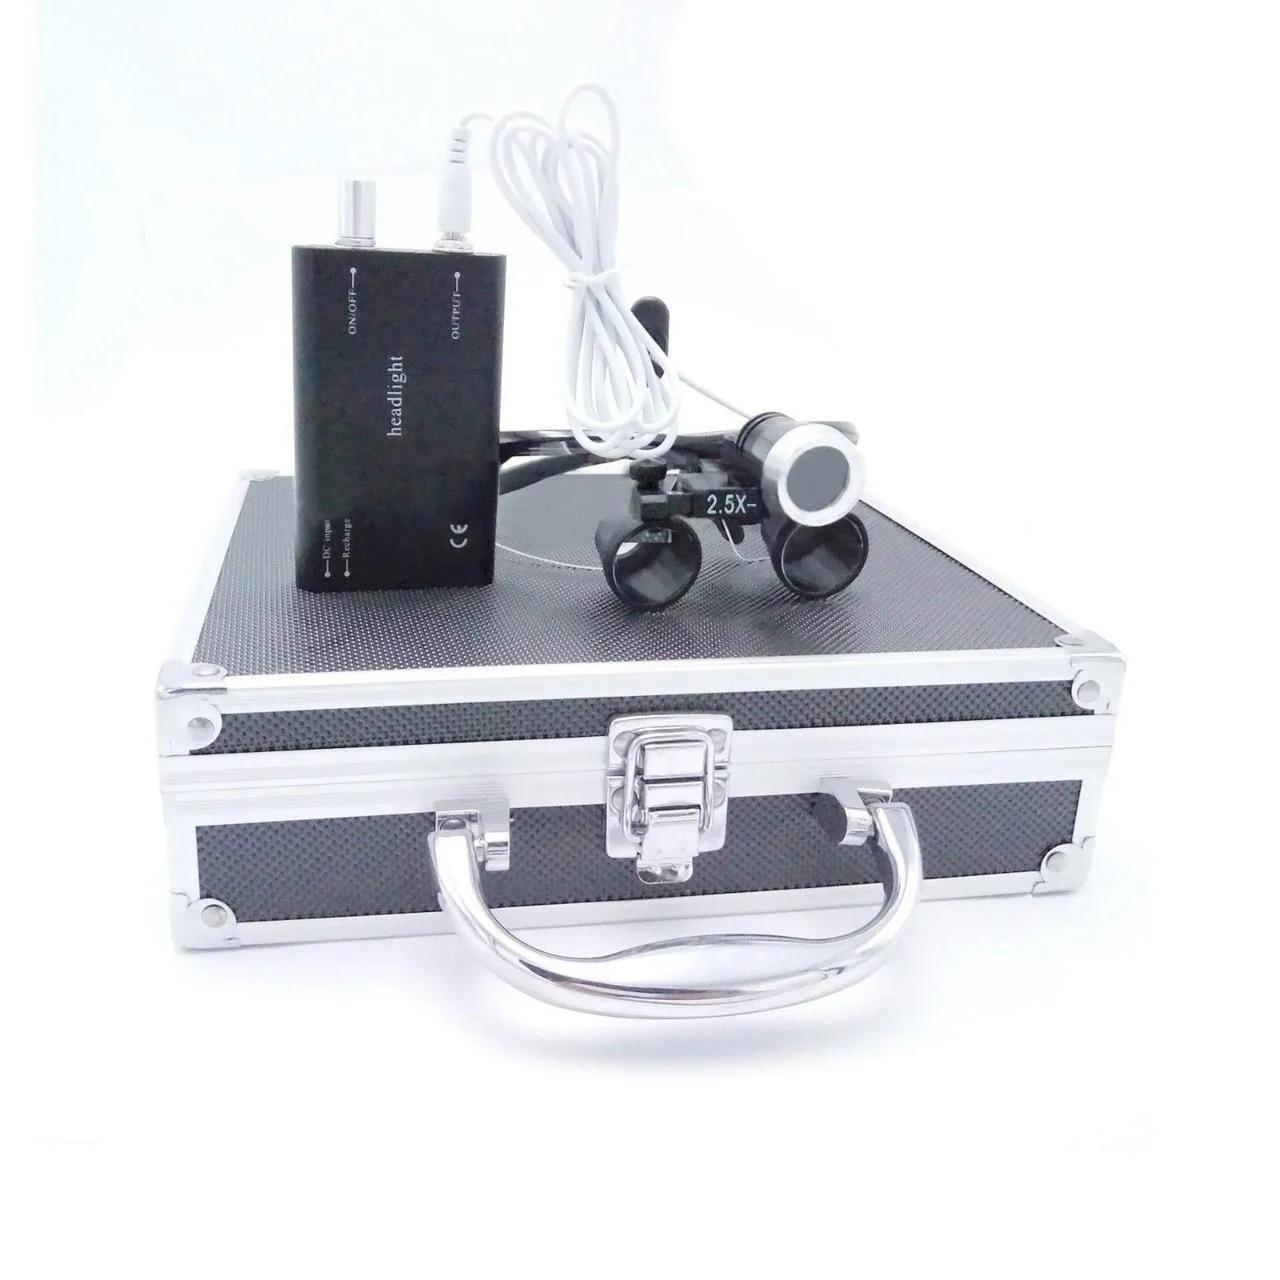 Комплект бинокуляры B1 2.5x-420 + подсветка